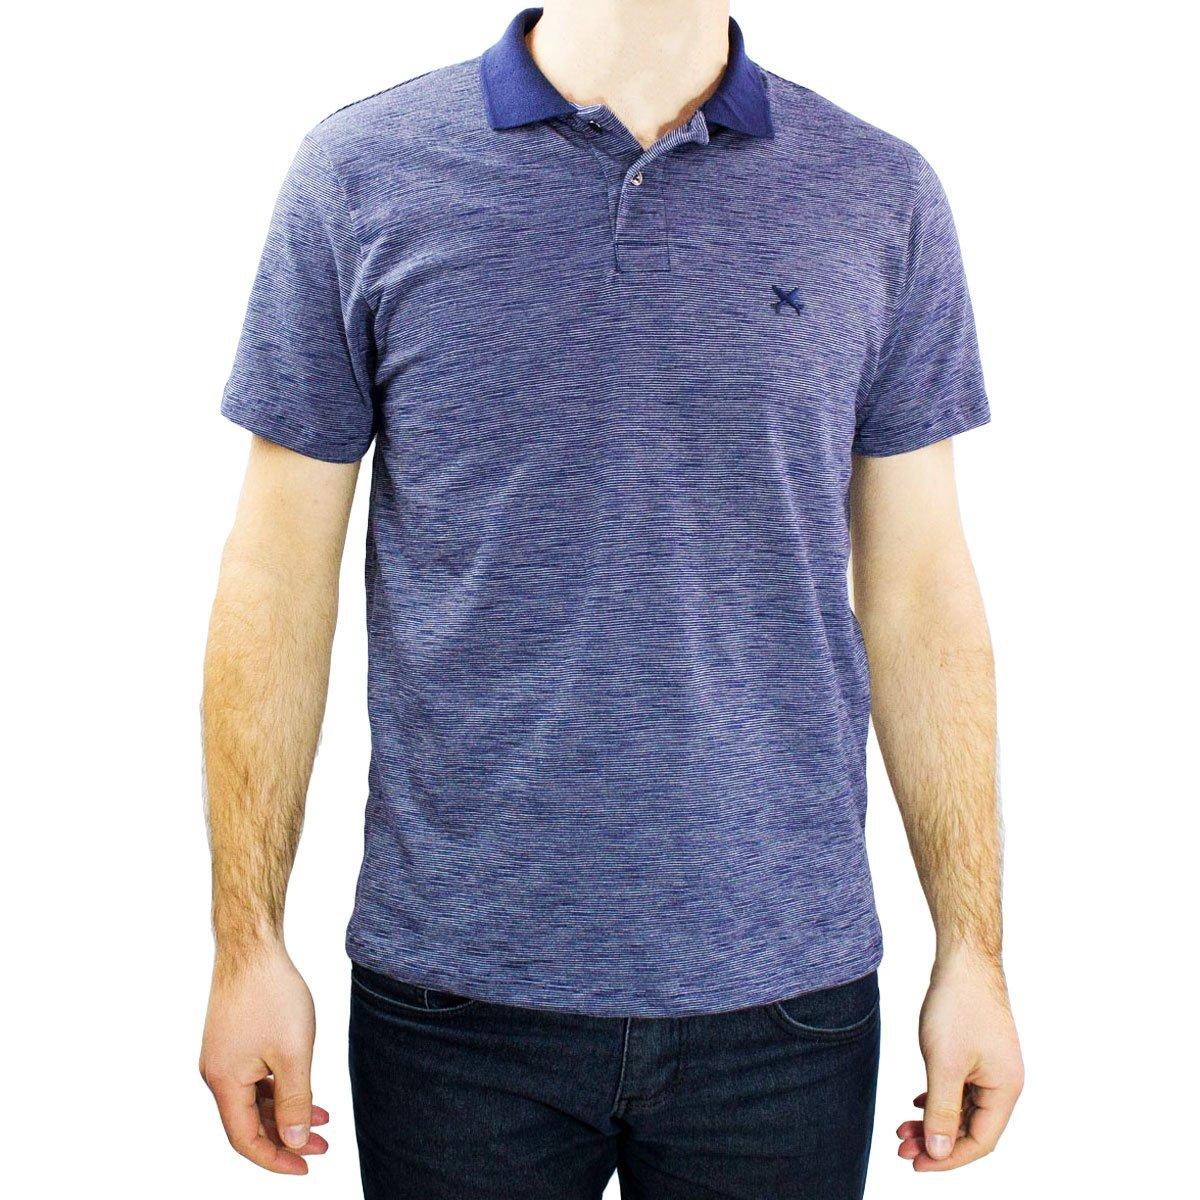 56d80c1c0e Bizz Store - Camisa Polo Masculina Hering Tal Pai Tal Filho